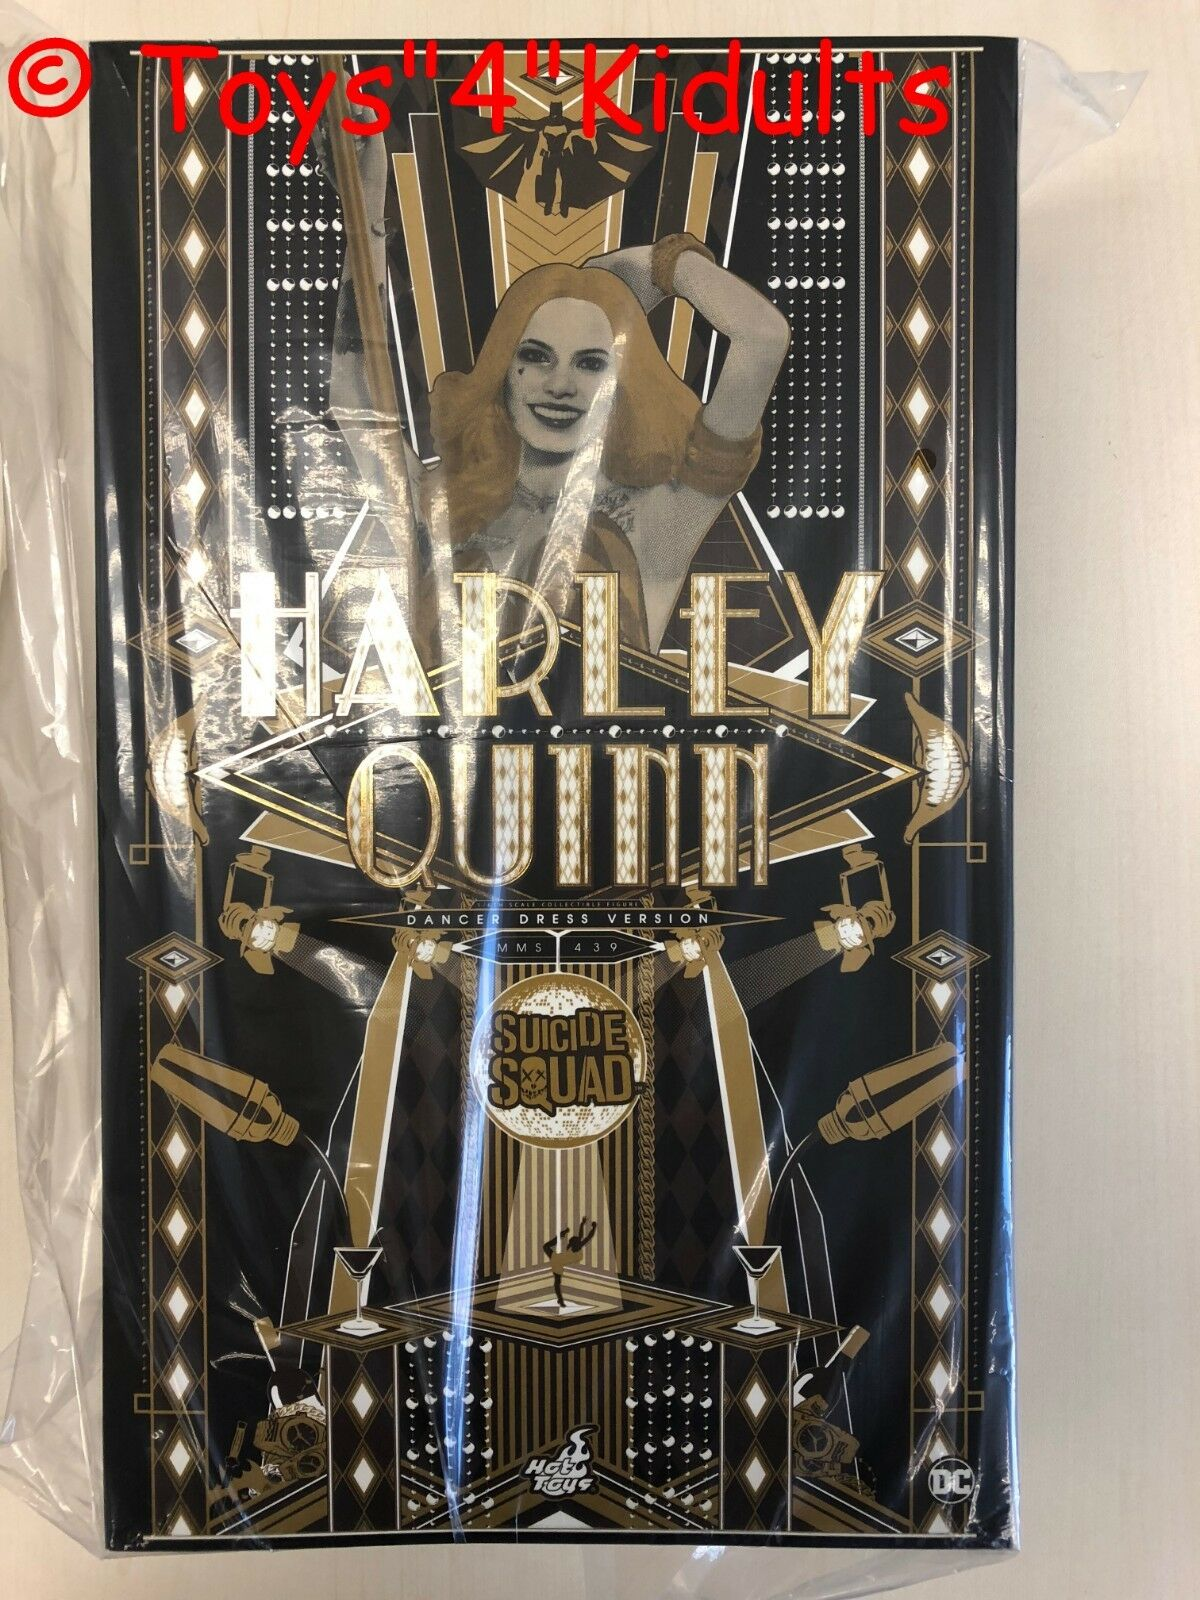 Hot Toys MMS 439 suicidio escuadrón Harley Quinn Vestido de bailarina Margot Robbie (versión)